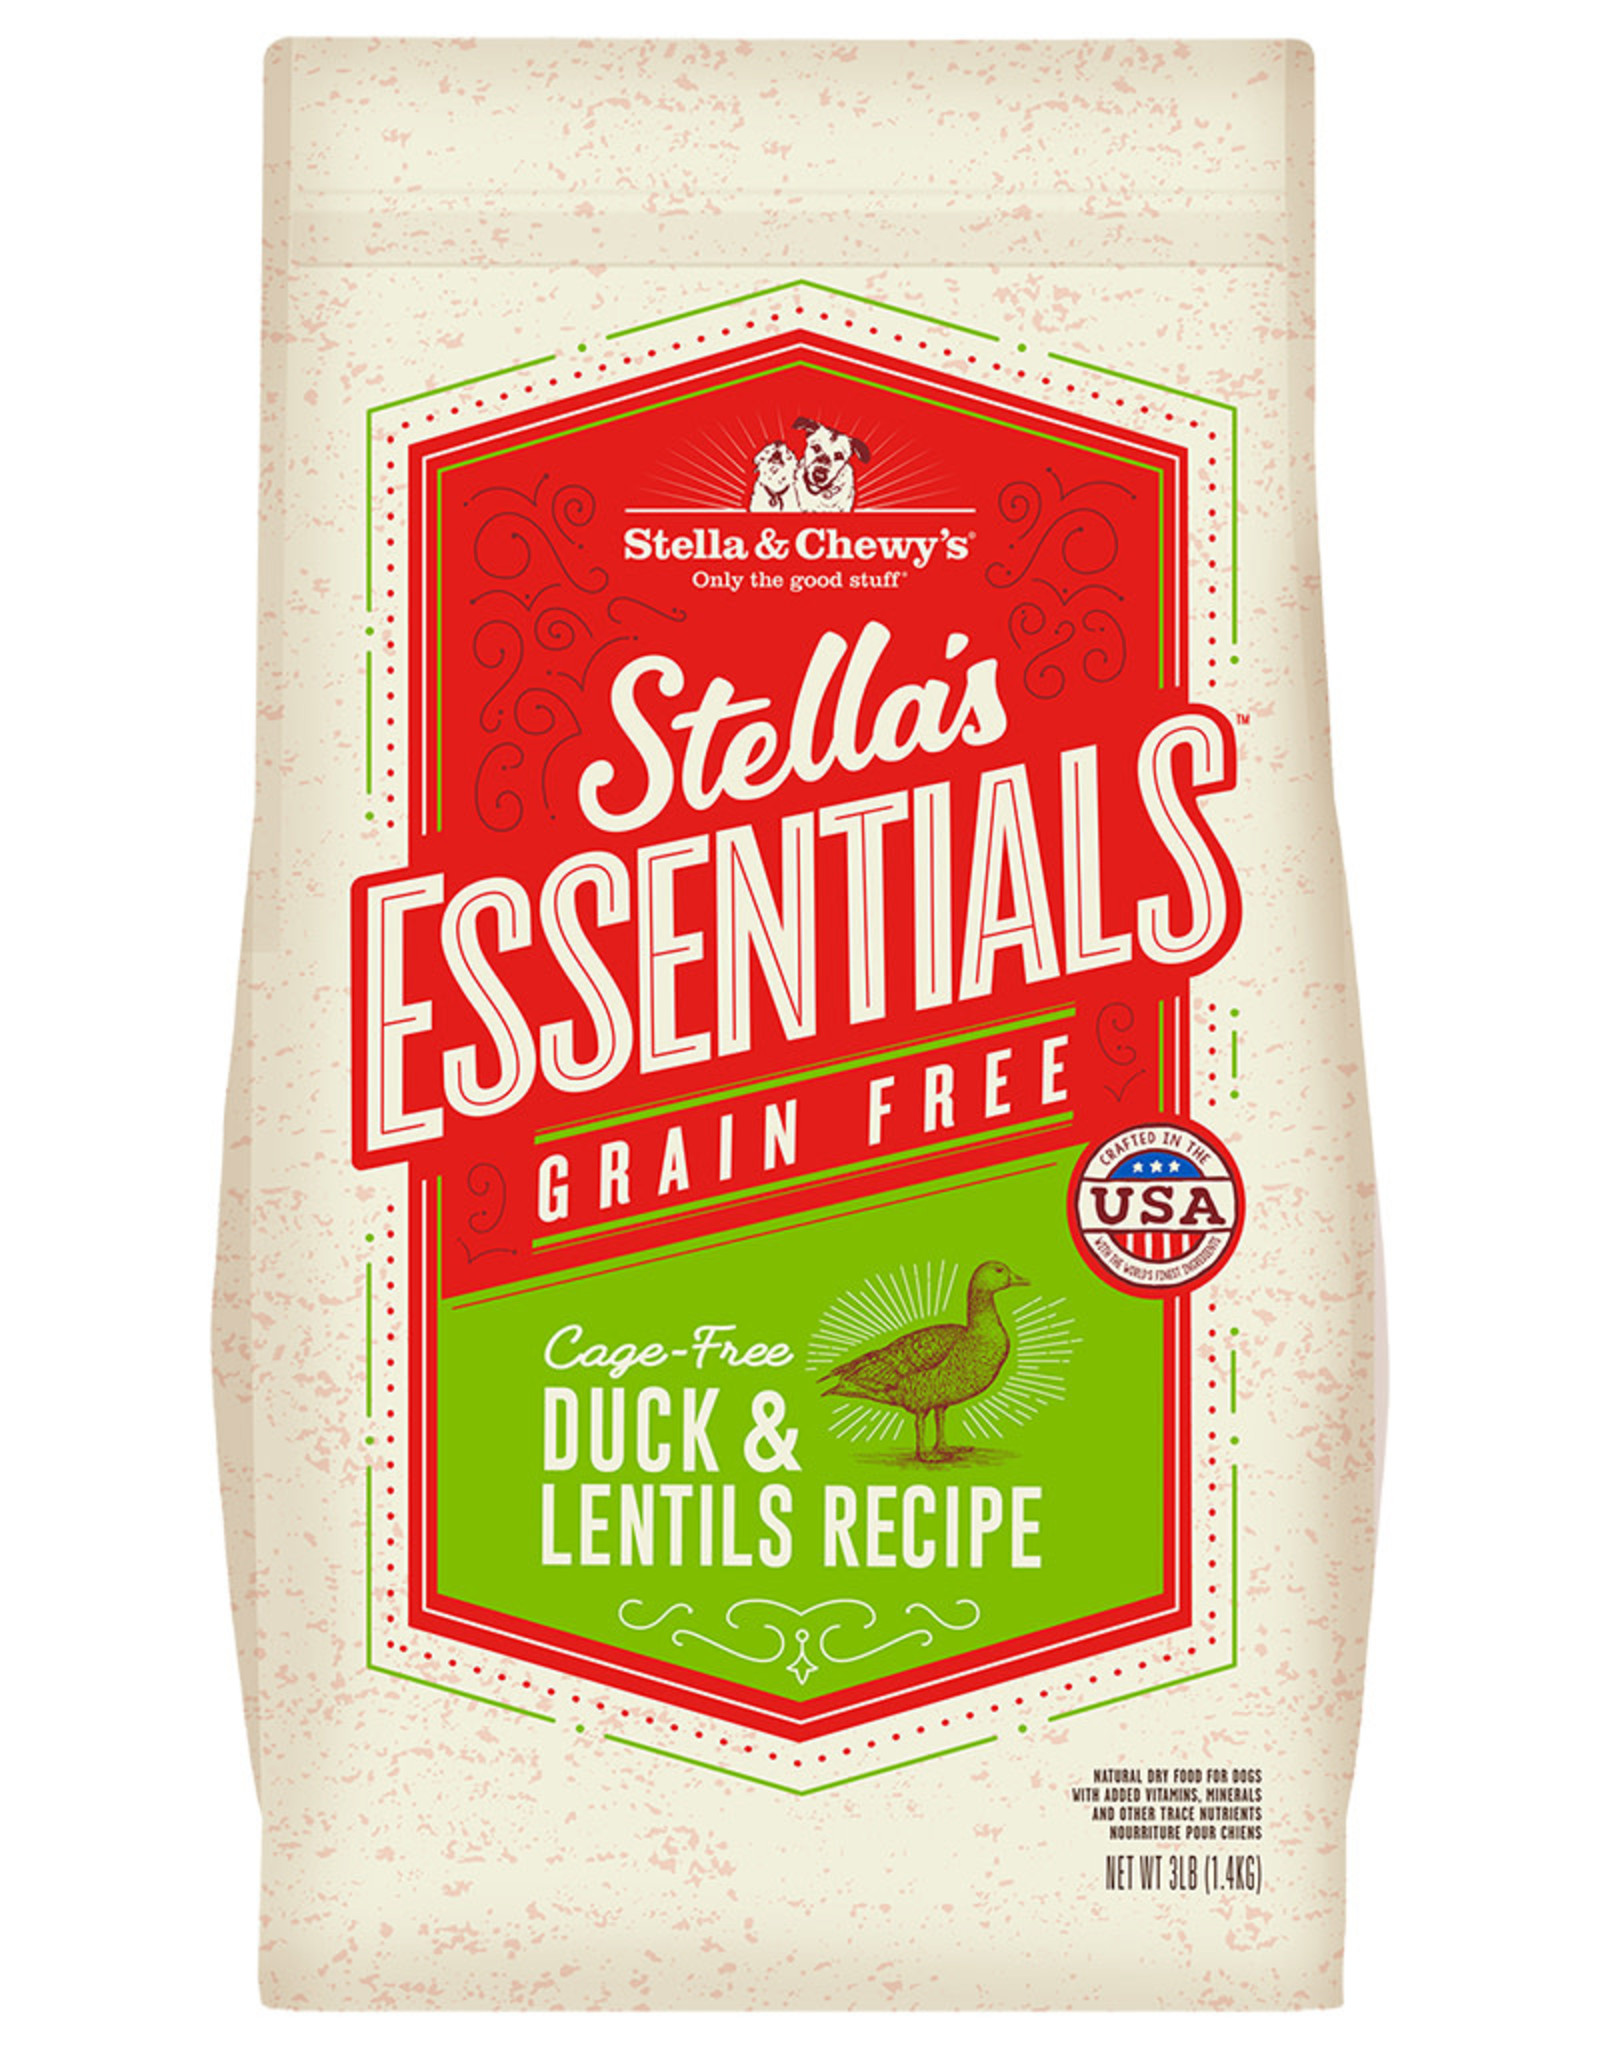 Stella & chewy's SC Essentials Grain Free Duck & Lentils 25LB